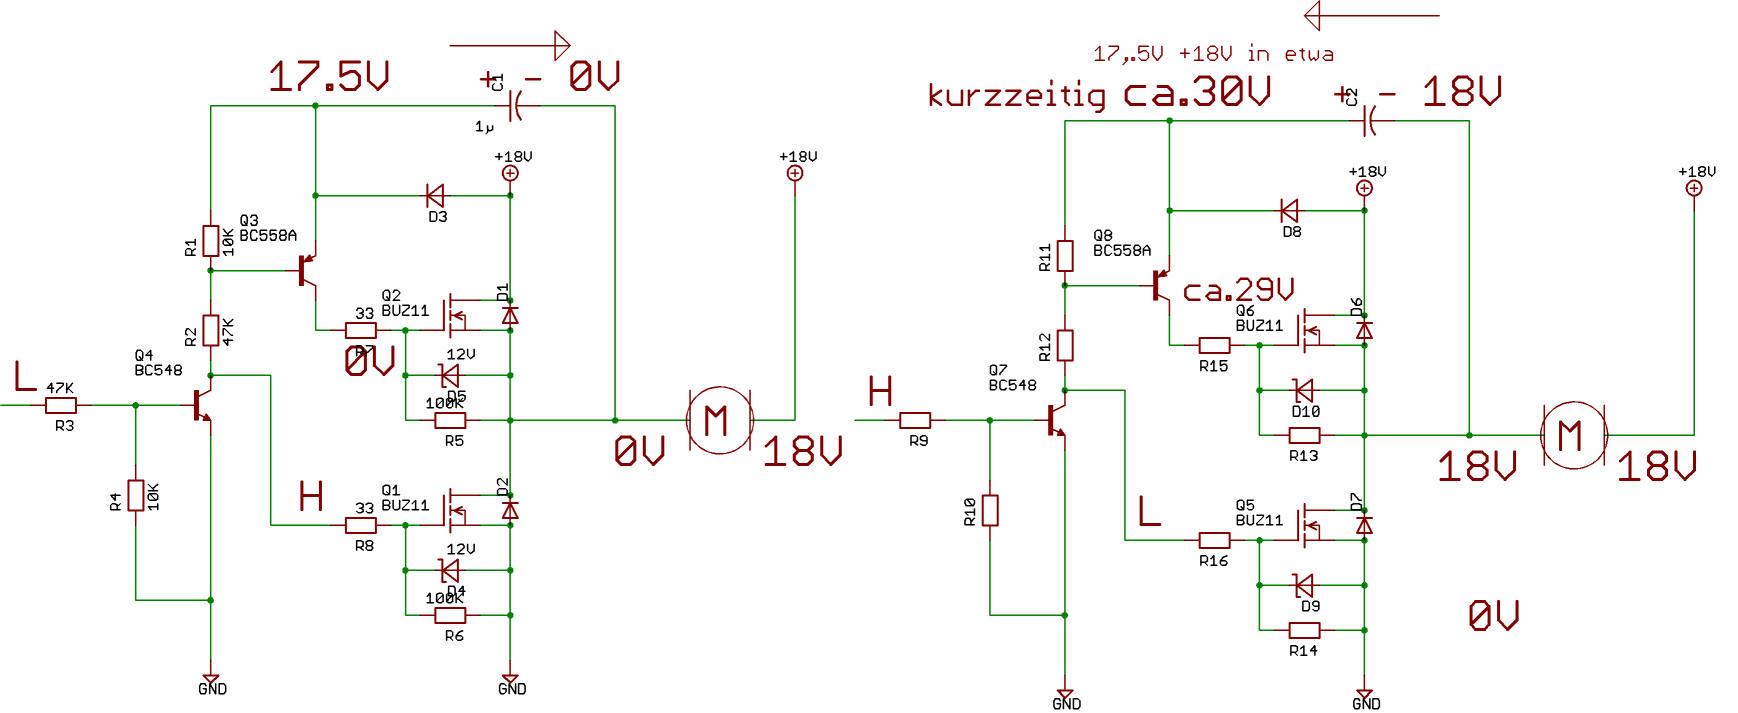 DC-Motor schnell abschalten - Mikrocontroller.net